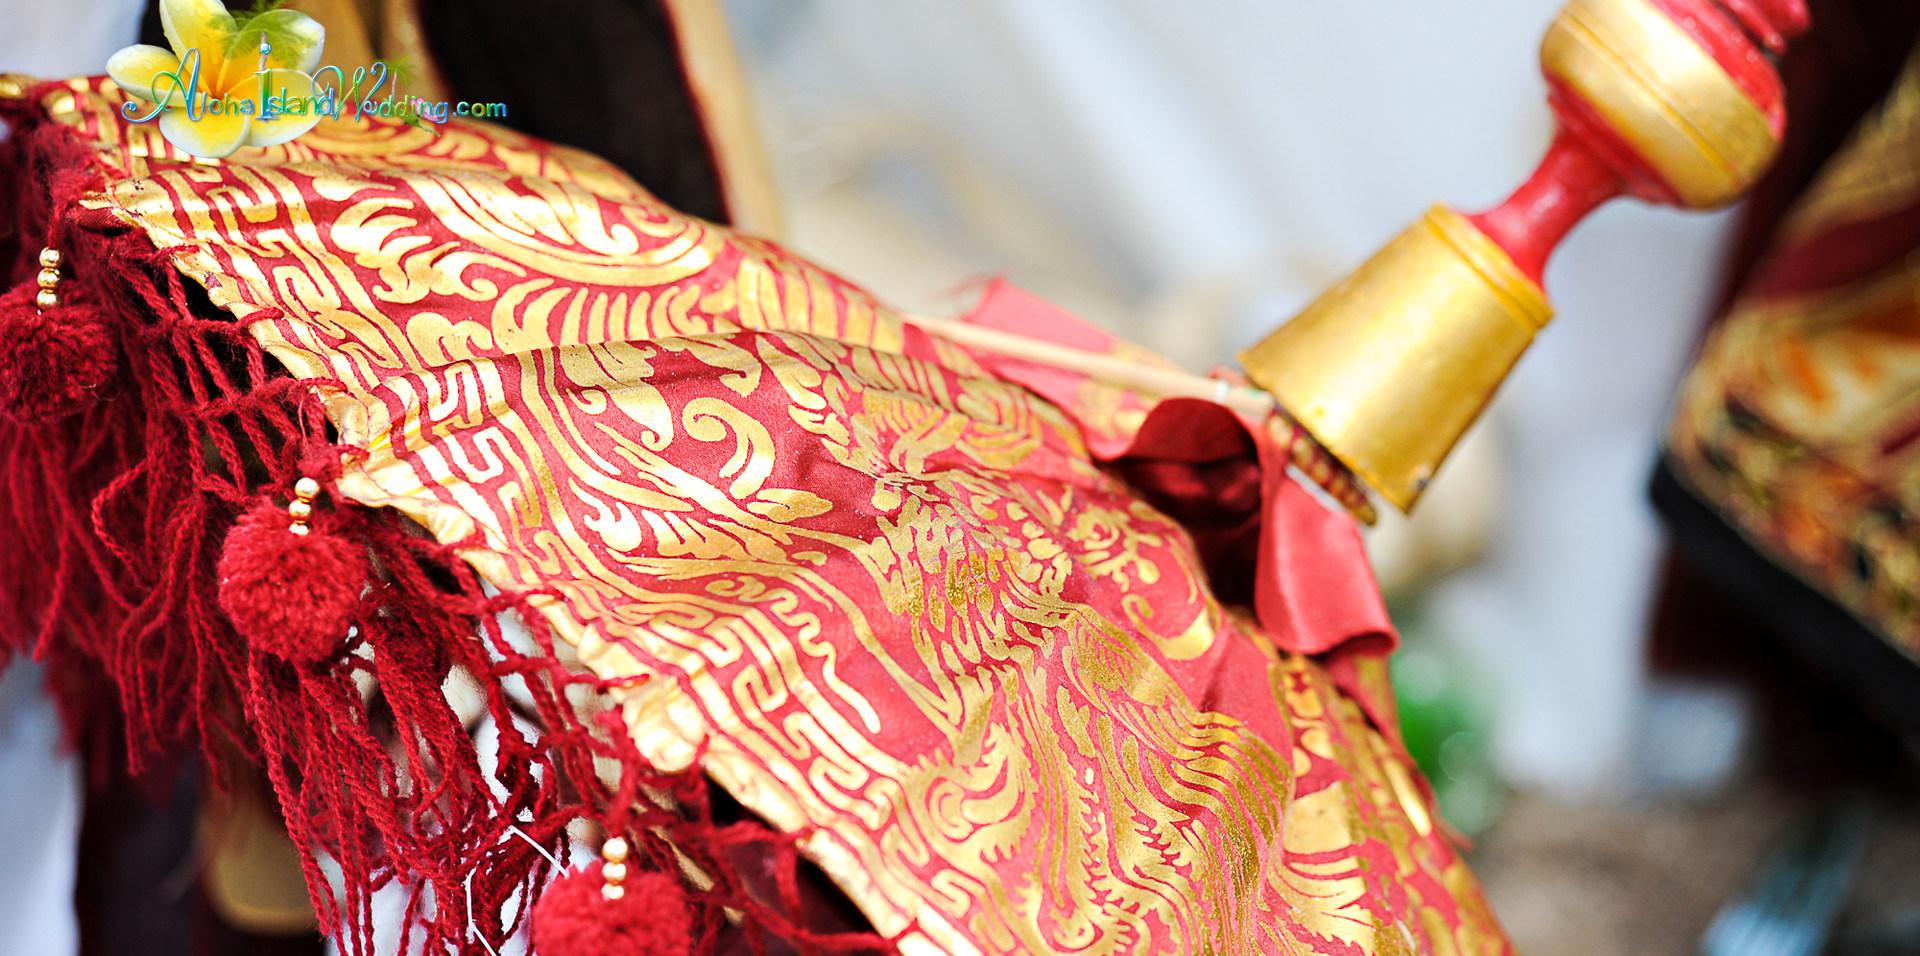 Indian wedding ceremony in hawaii-60.jpg